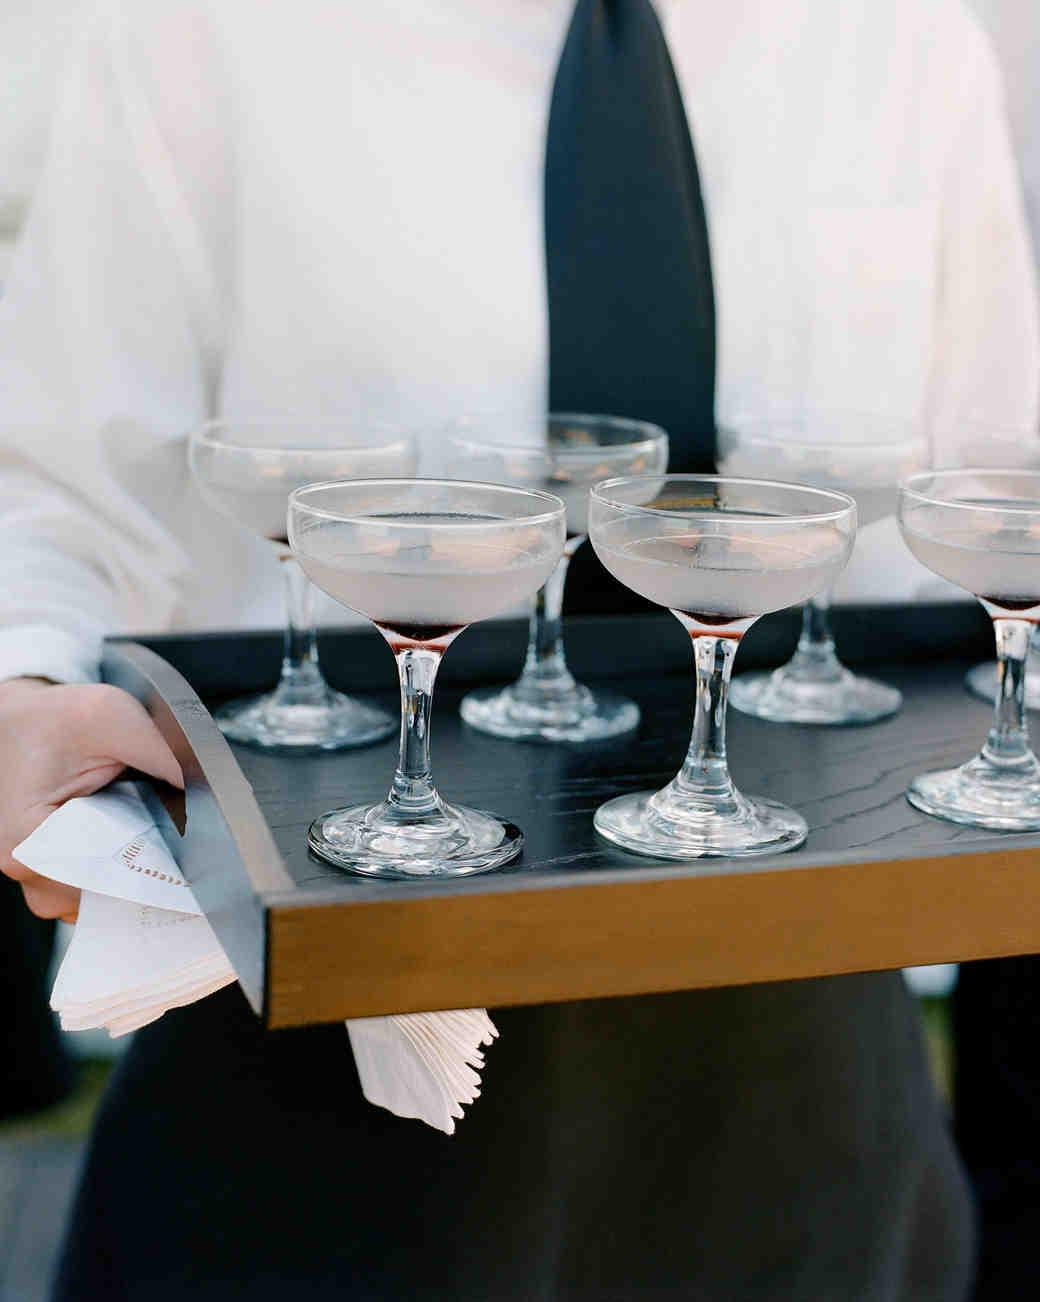 whitney zach wedding cocktails gin and creme de violette